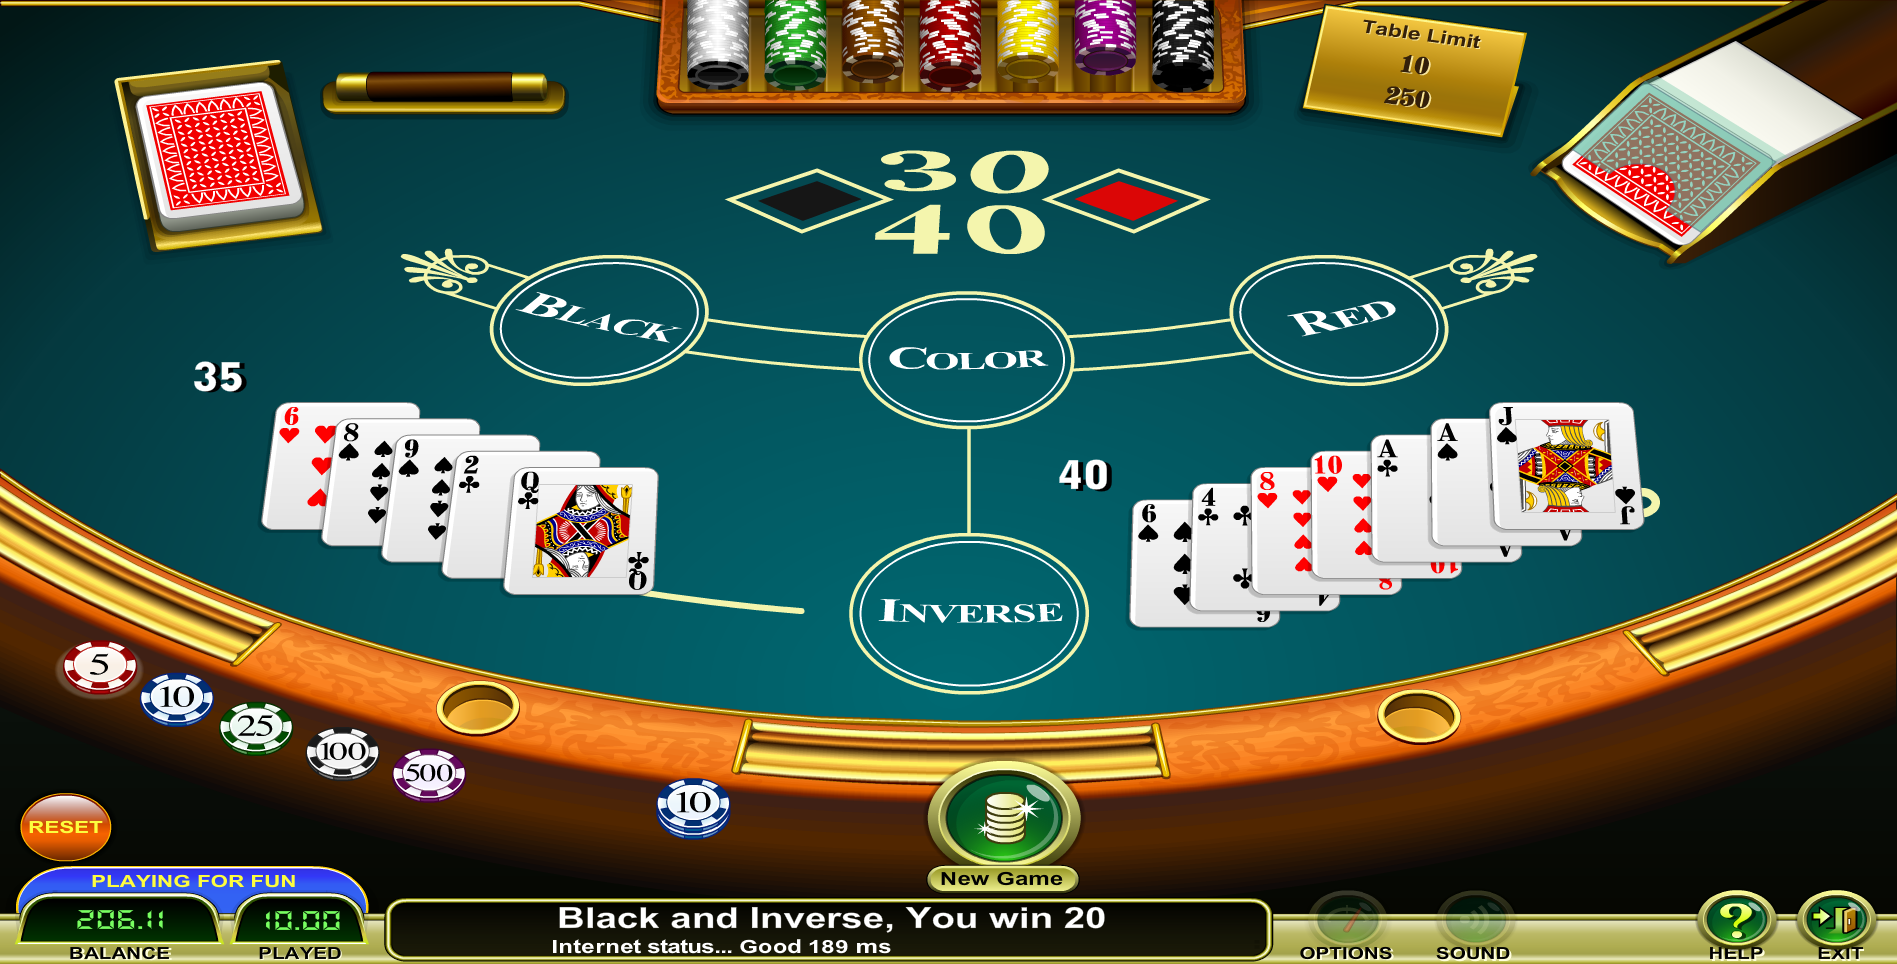 Spiele Trente Et Quarante (EspreГџo) - Video Slots Online